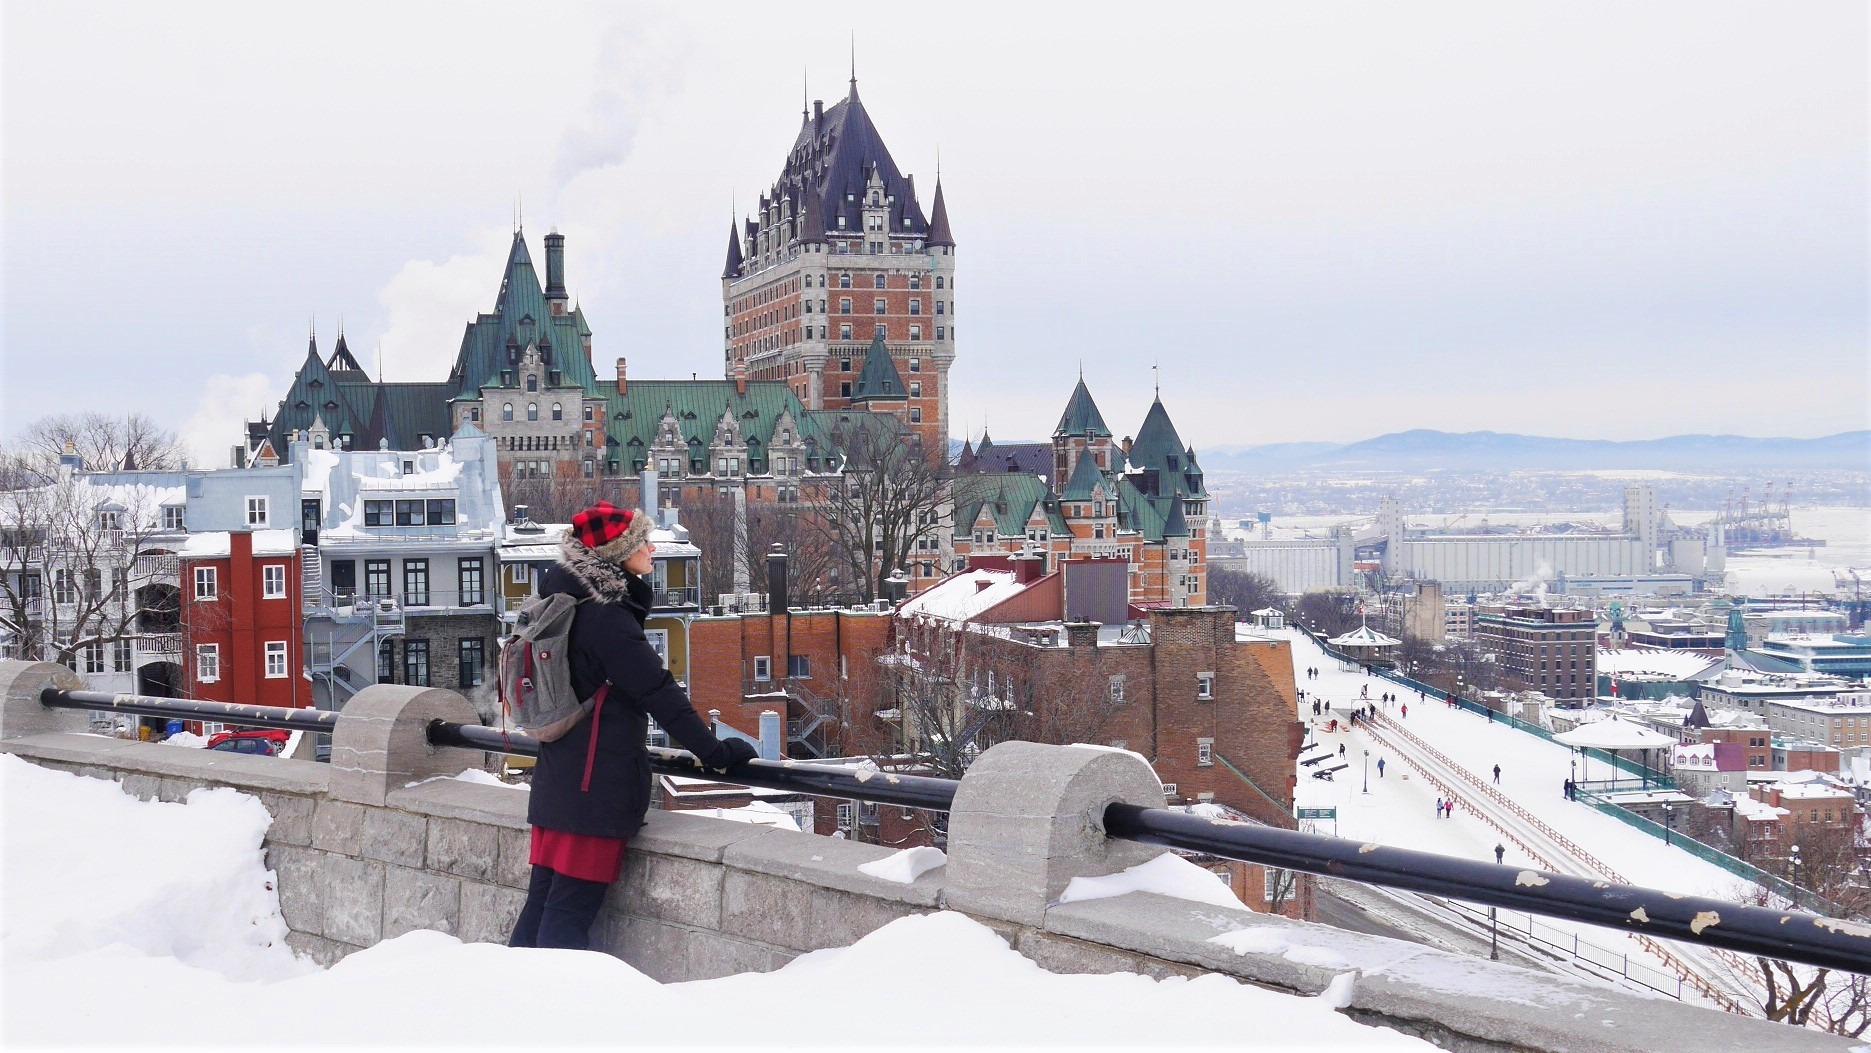 Quebec noel château Frontenac terrasse dufferin comment s'habiller canada hiver blog voyage arpenter le chemin